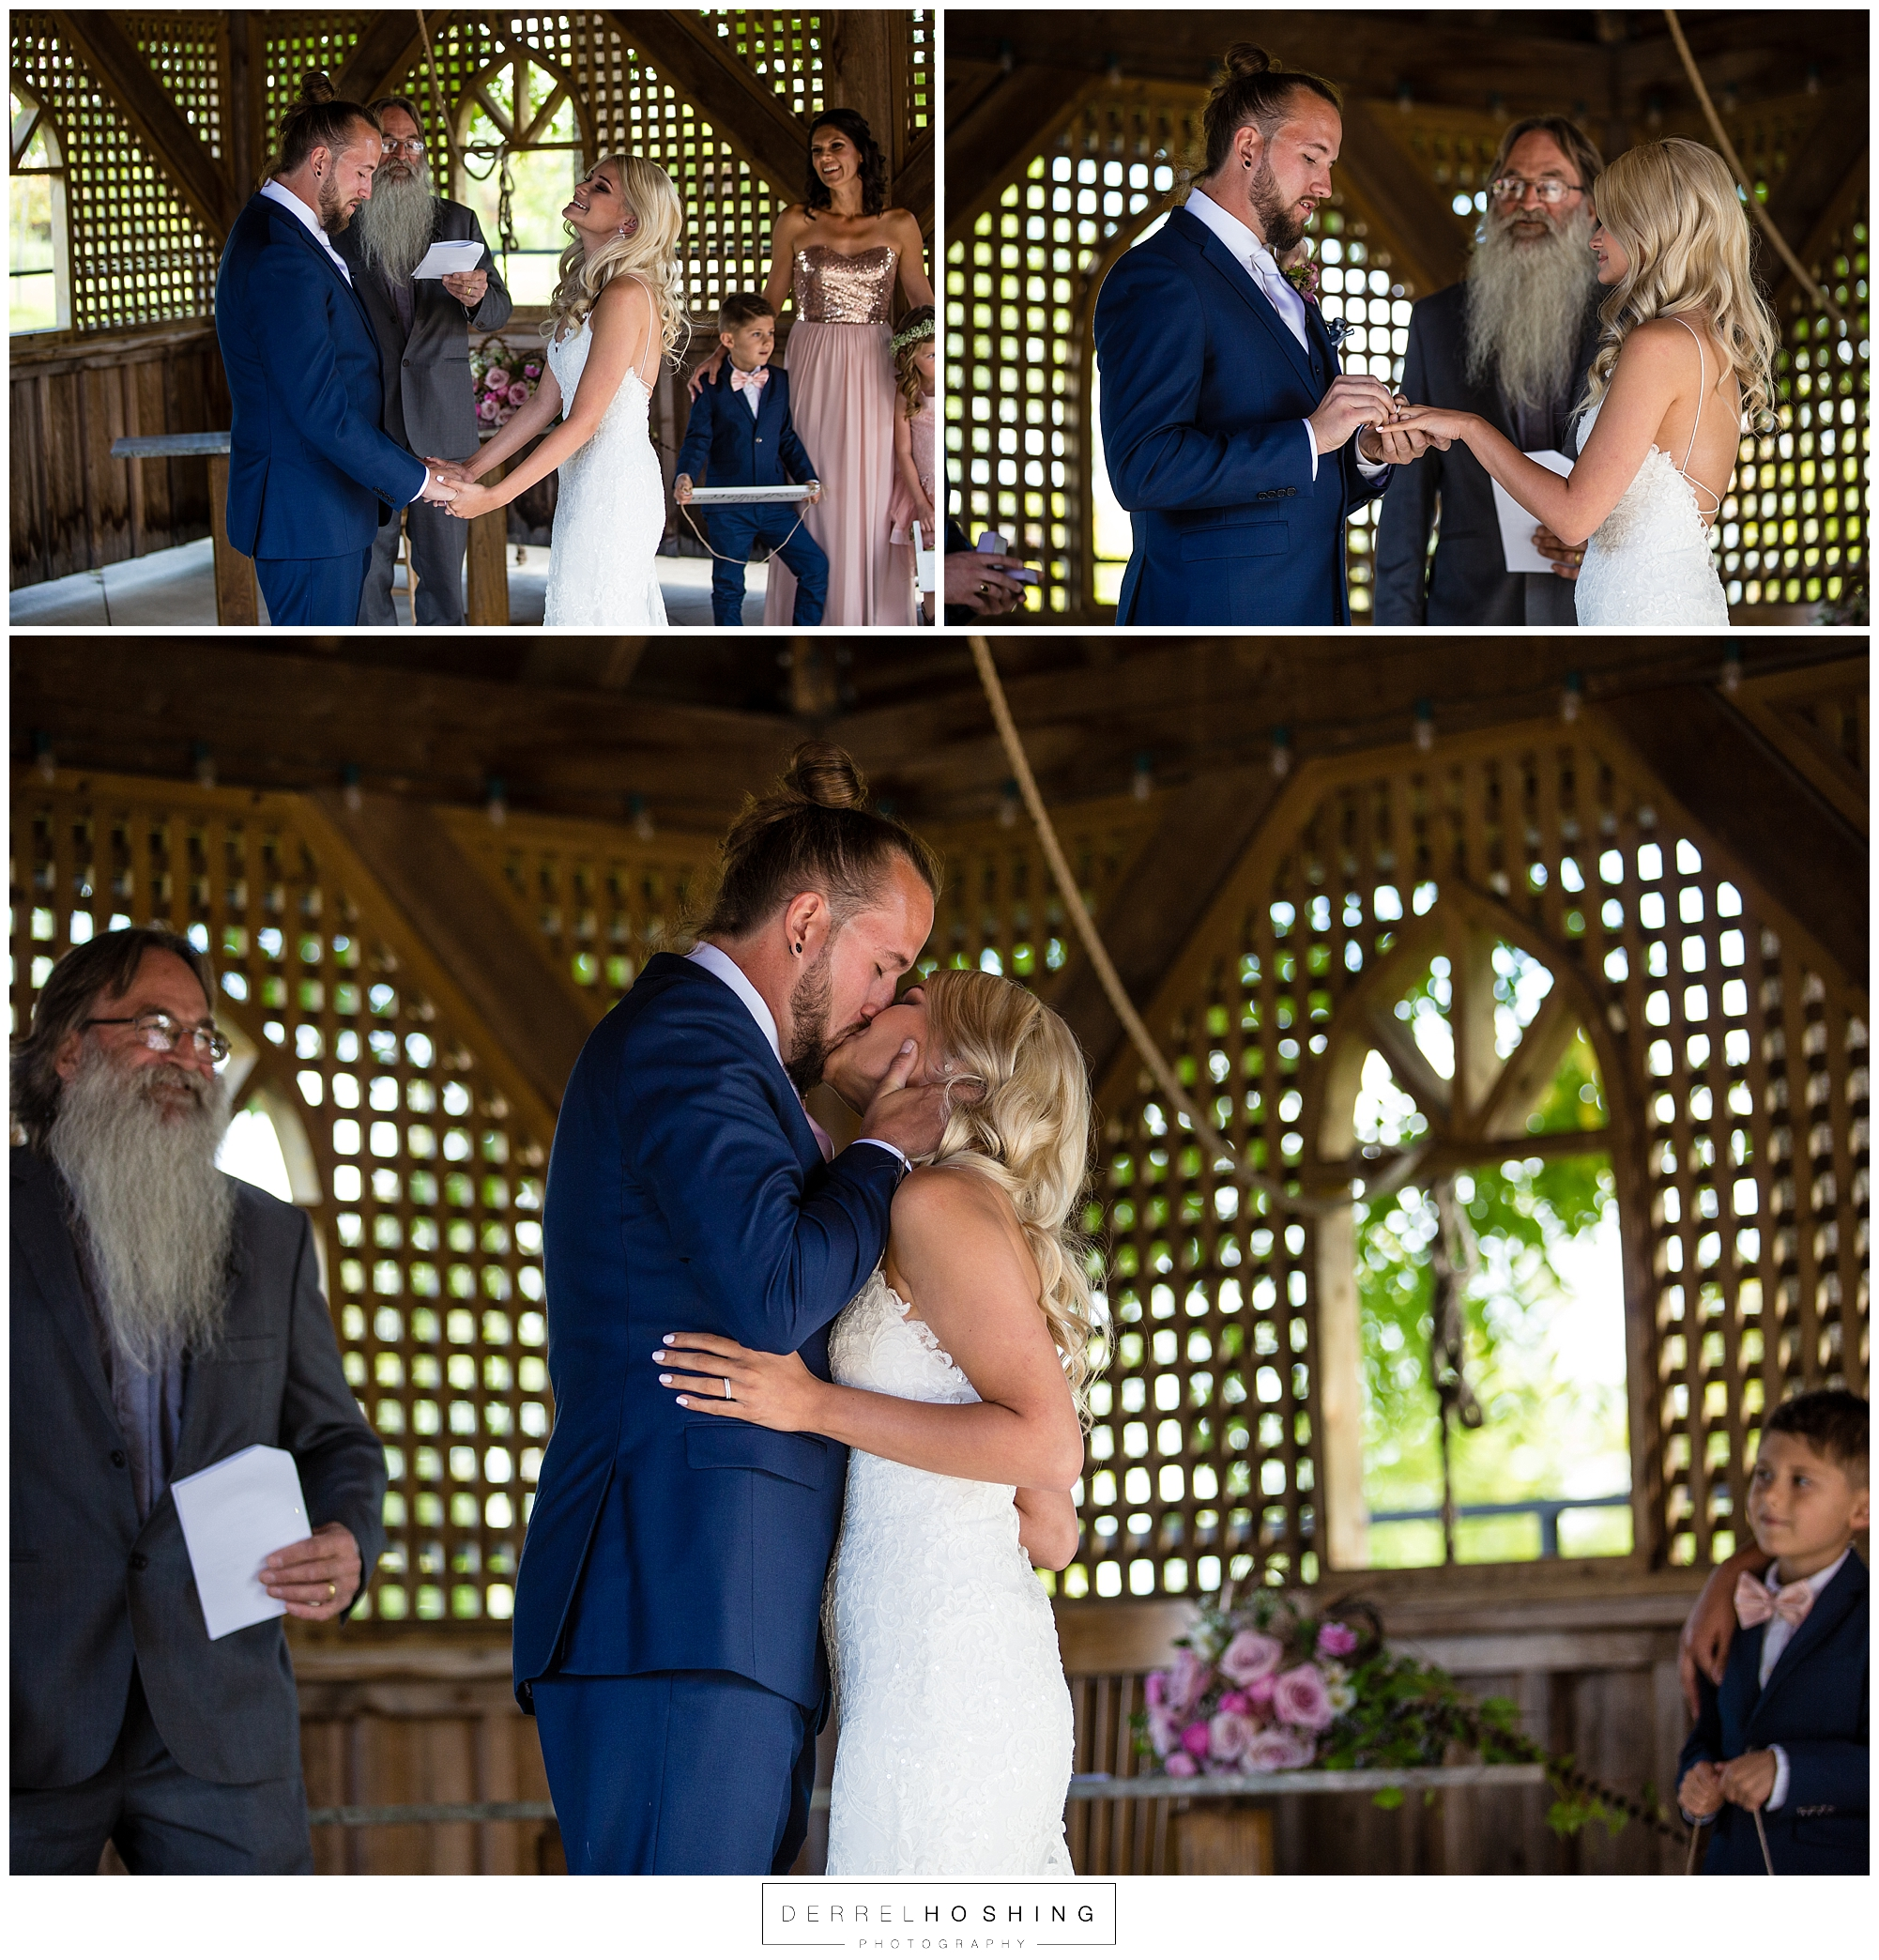 Belcroft-Estates-&-Event-Centre-Wedding-Innisfil-Ontario-0009.jpg